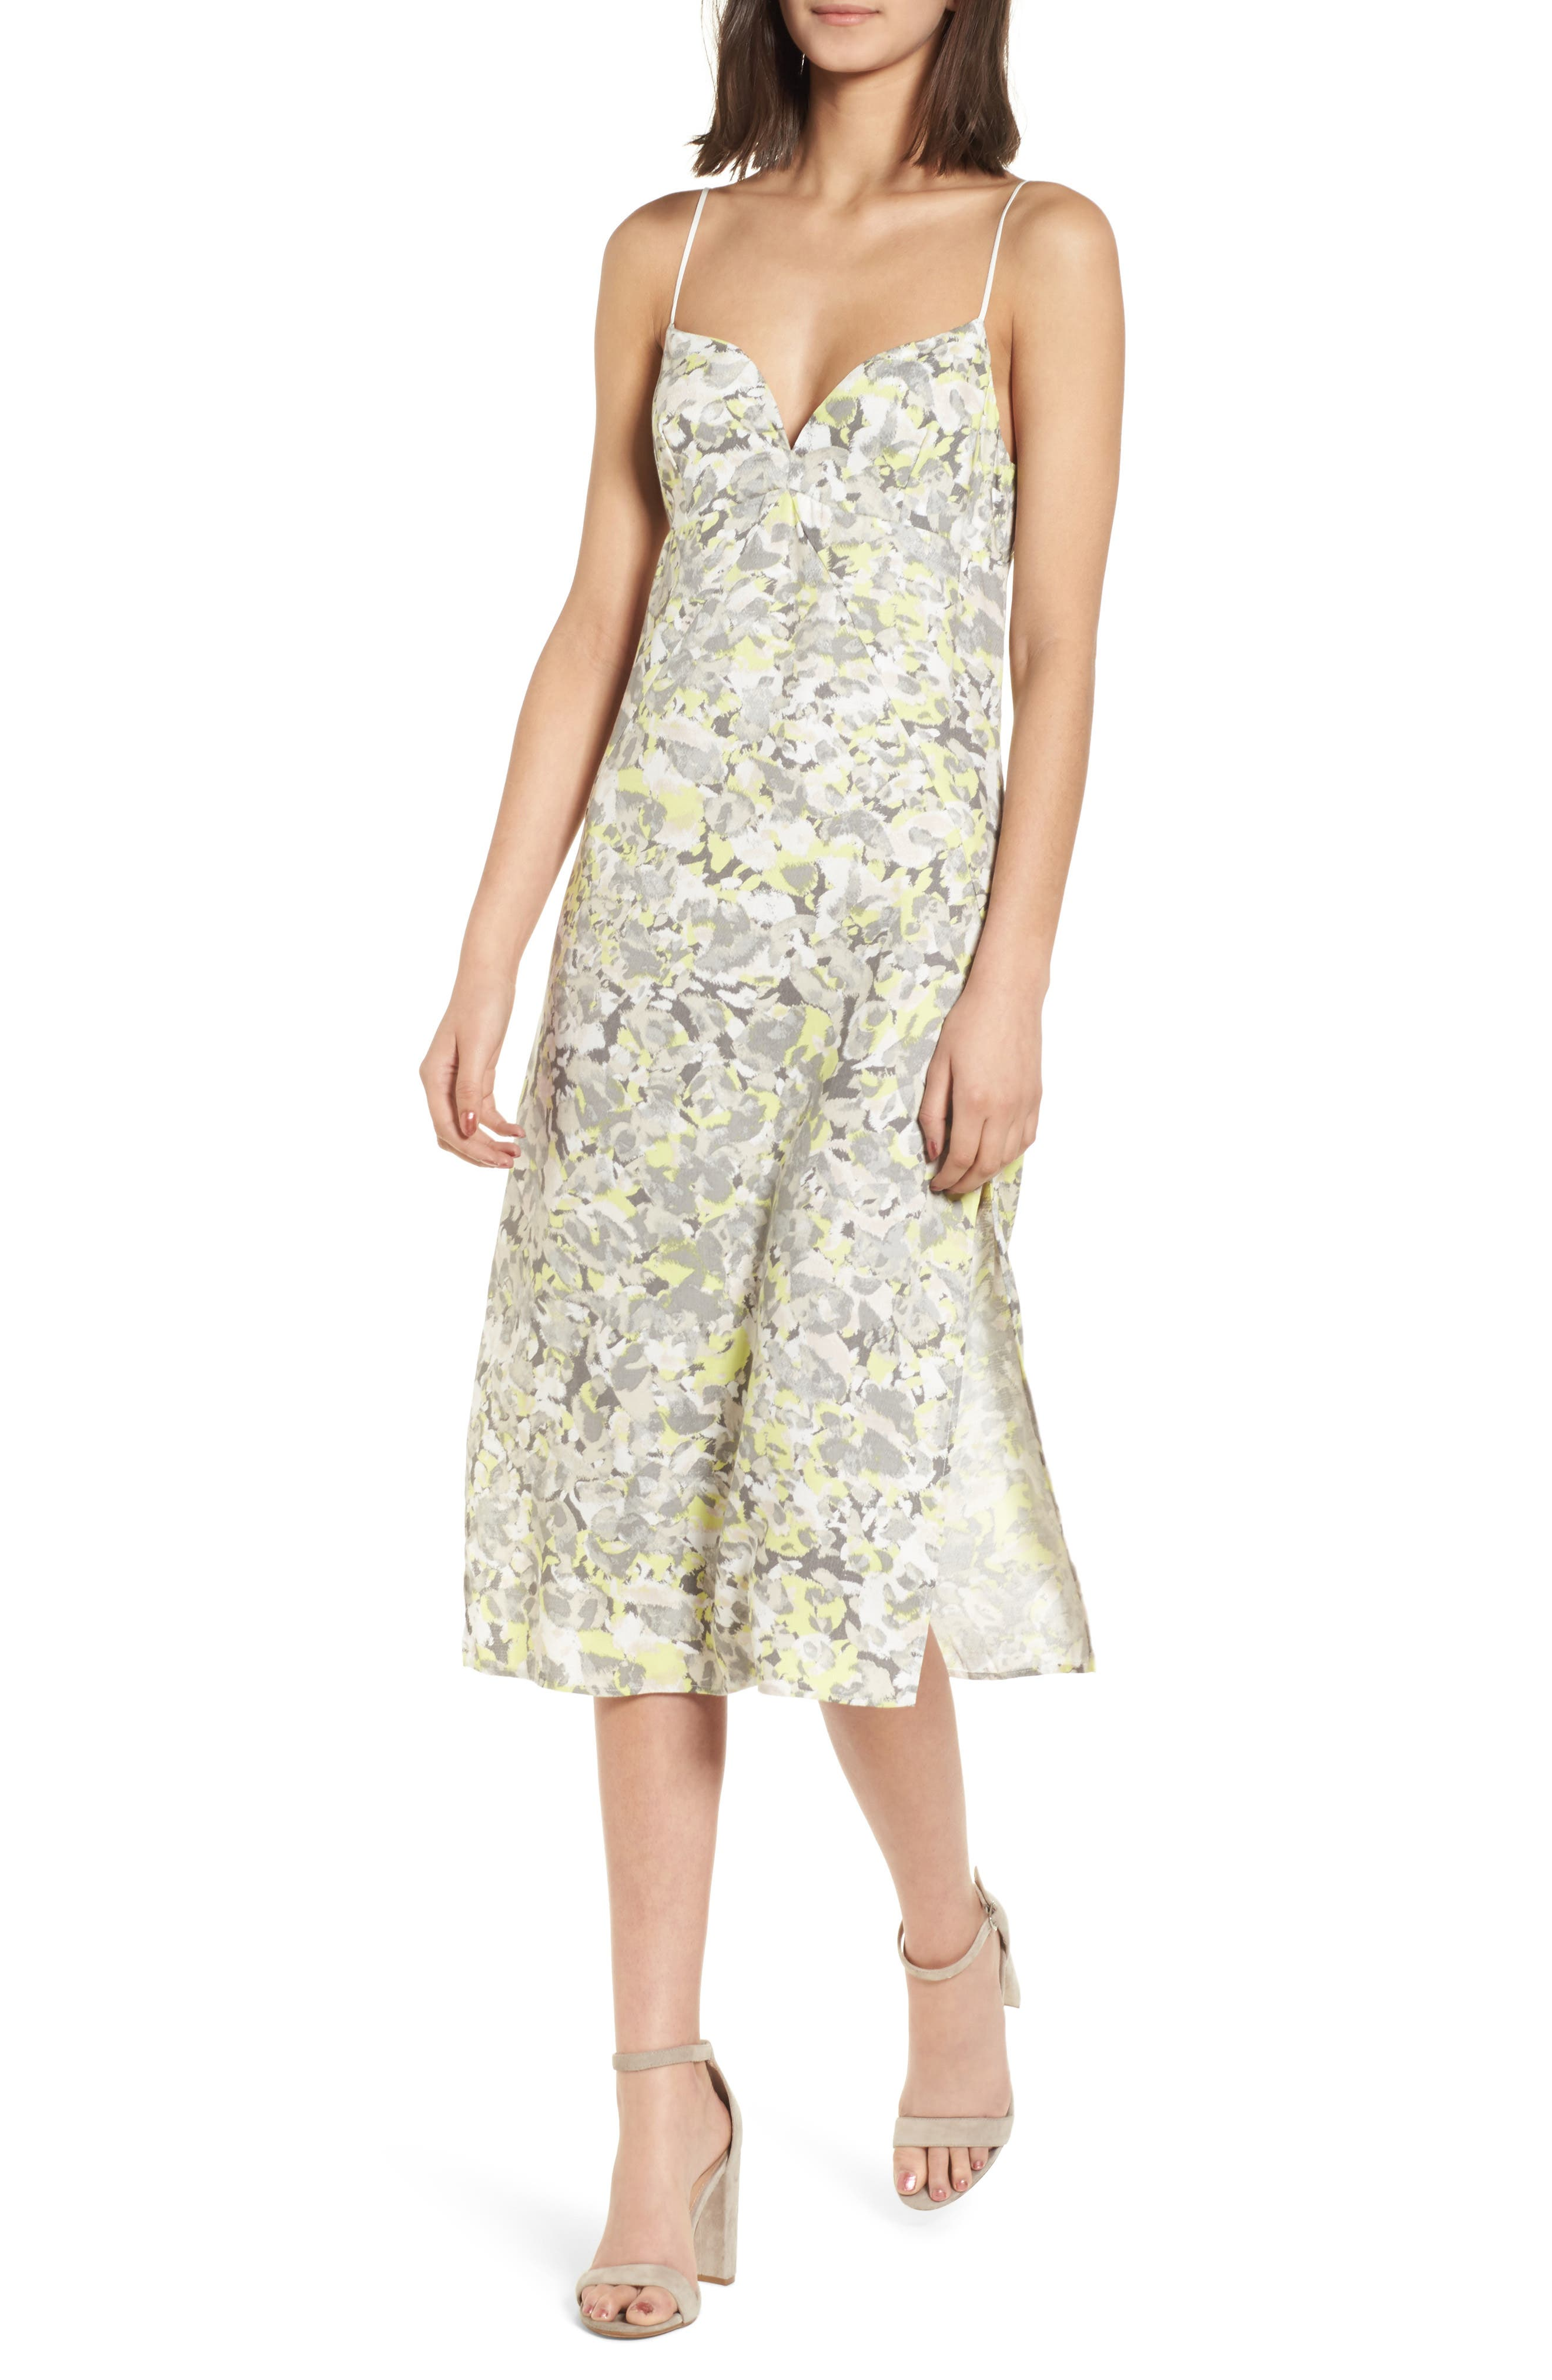 Splendid Skylight Camisole Dress